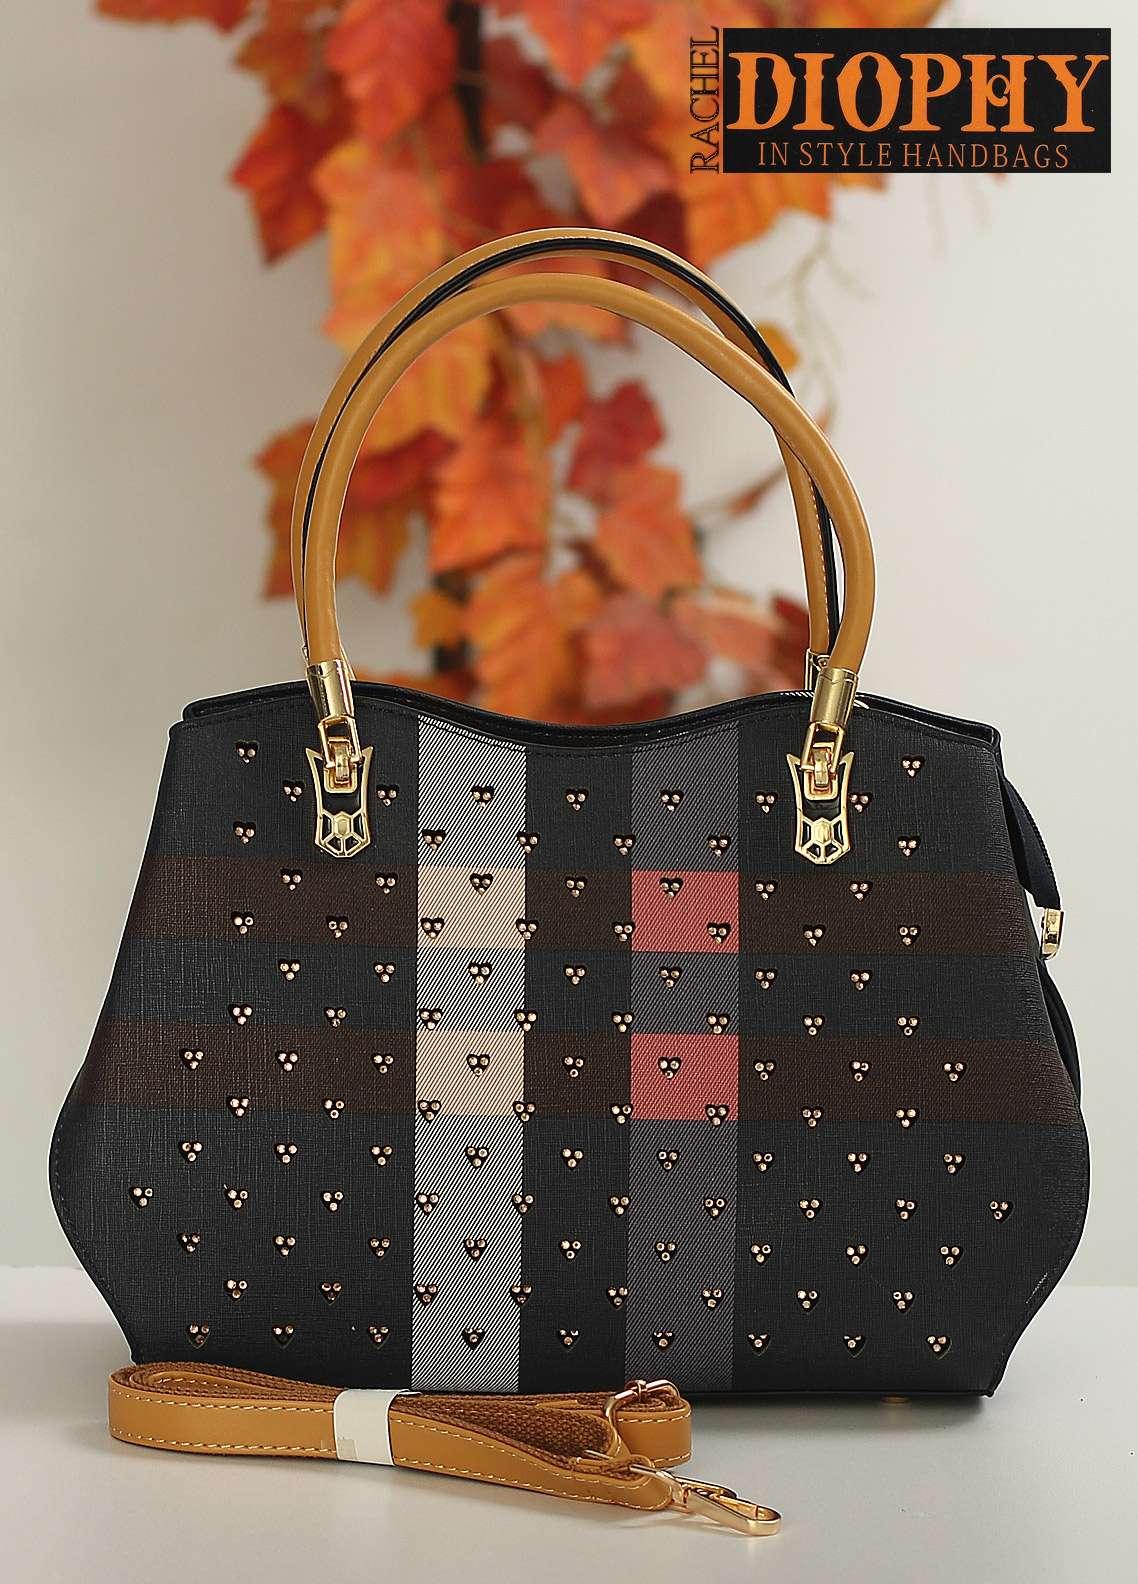 Rachel Diophy PU Leather Satchels Handbags for Women - Grey with Cut Work